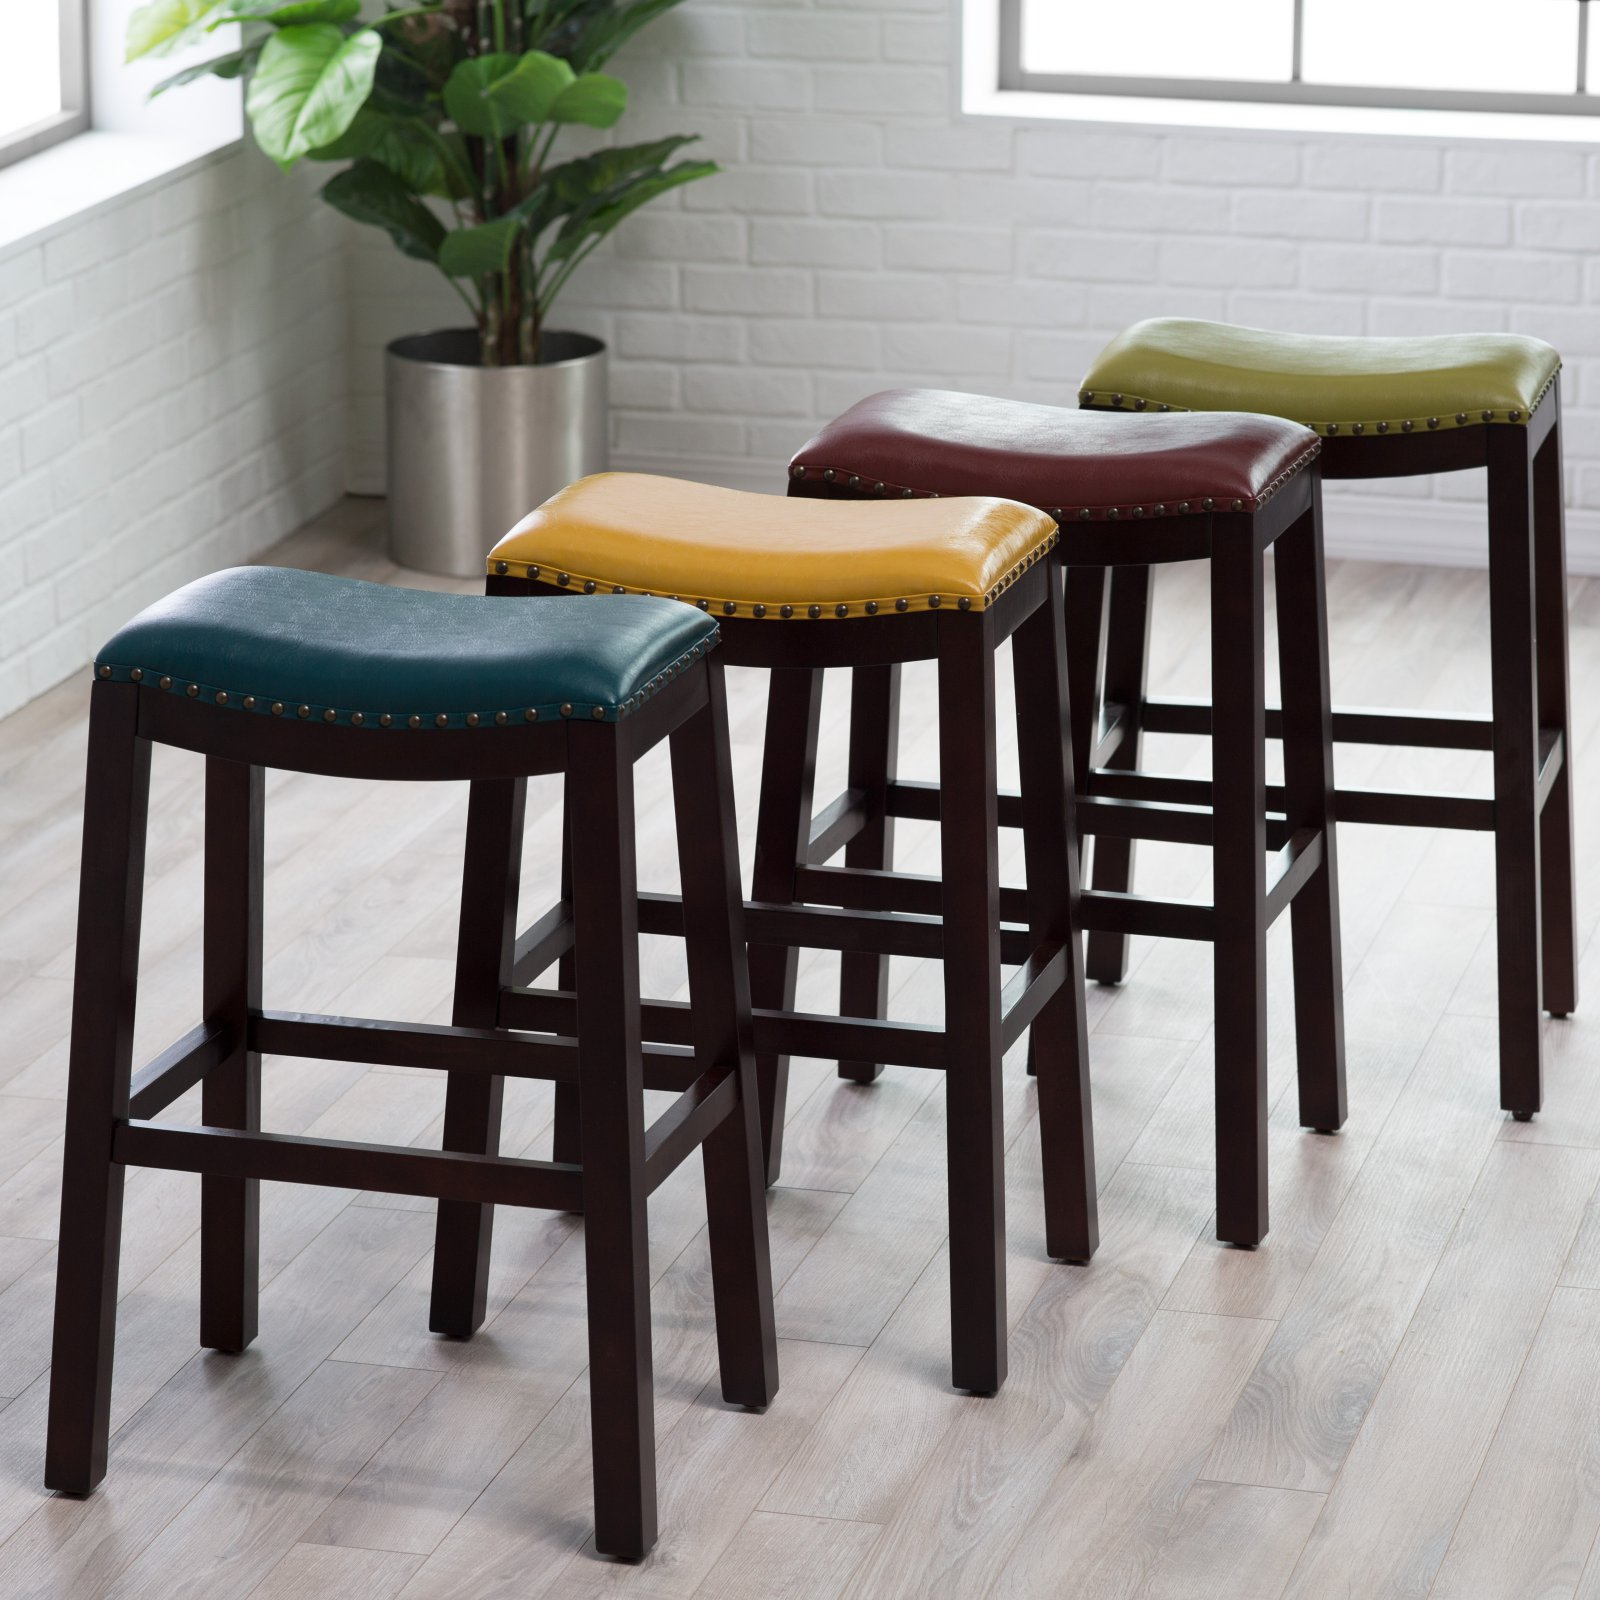 Incredible Belham Living Hutton Backless Bar Stool Uwap Interior Chair Design Uwaporg